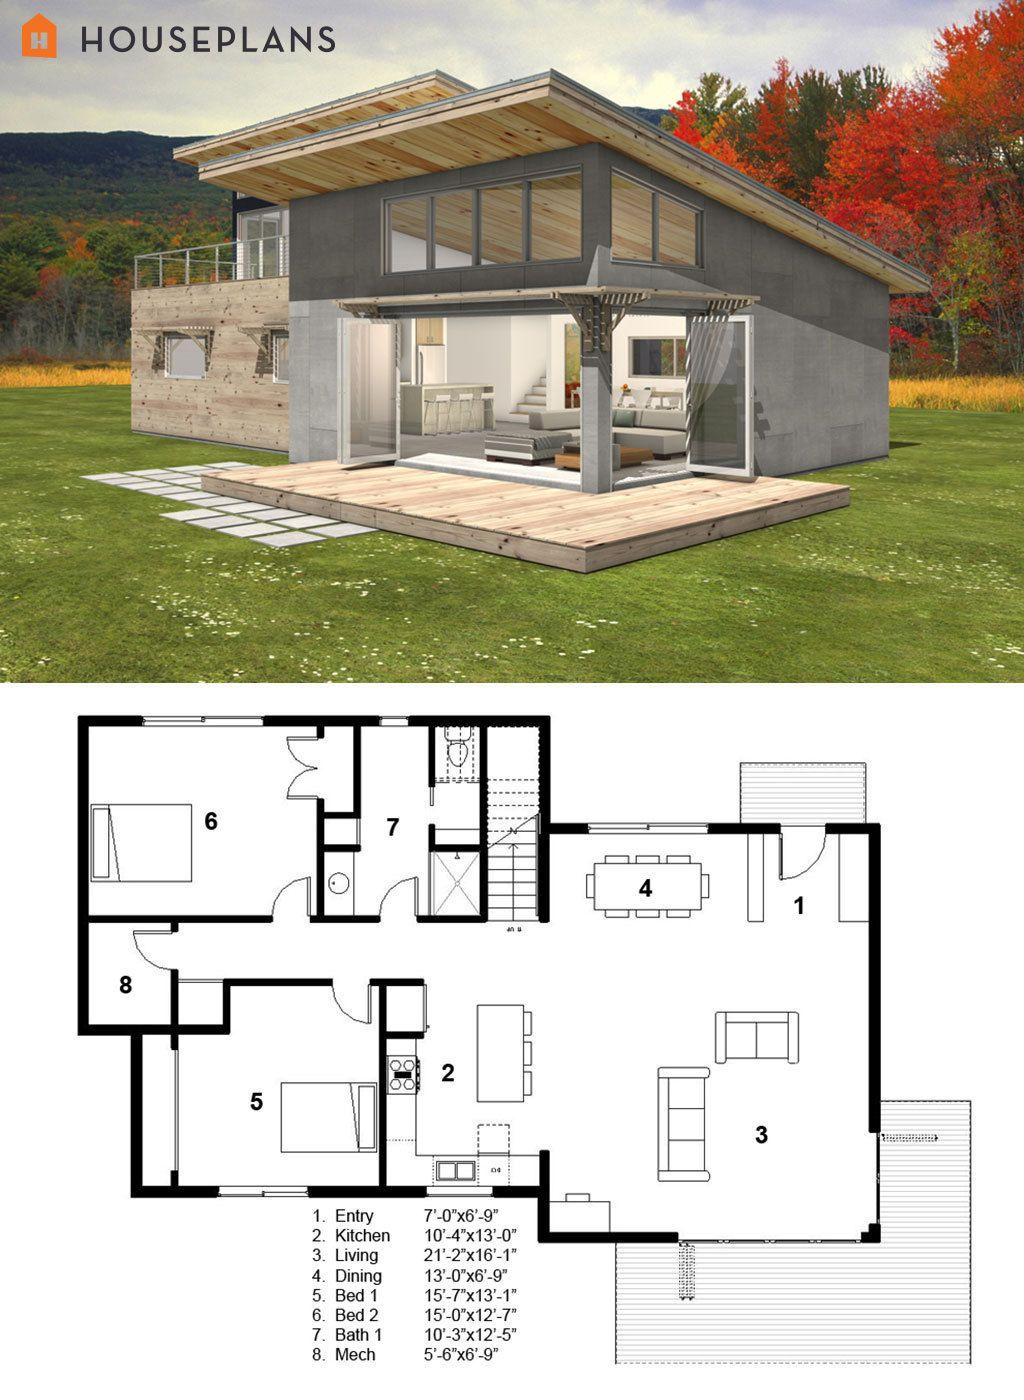 modern style house plan 3 beds 2 baths 2115 sq ft plan on best tiny house plan design ideas id=50142